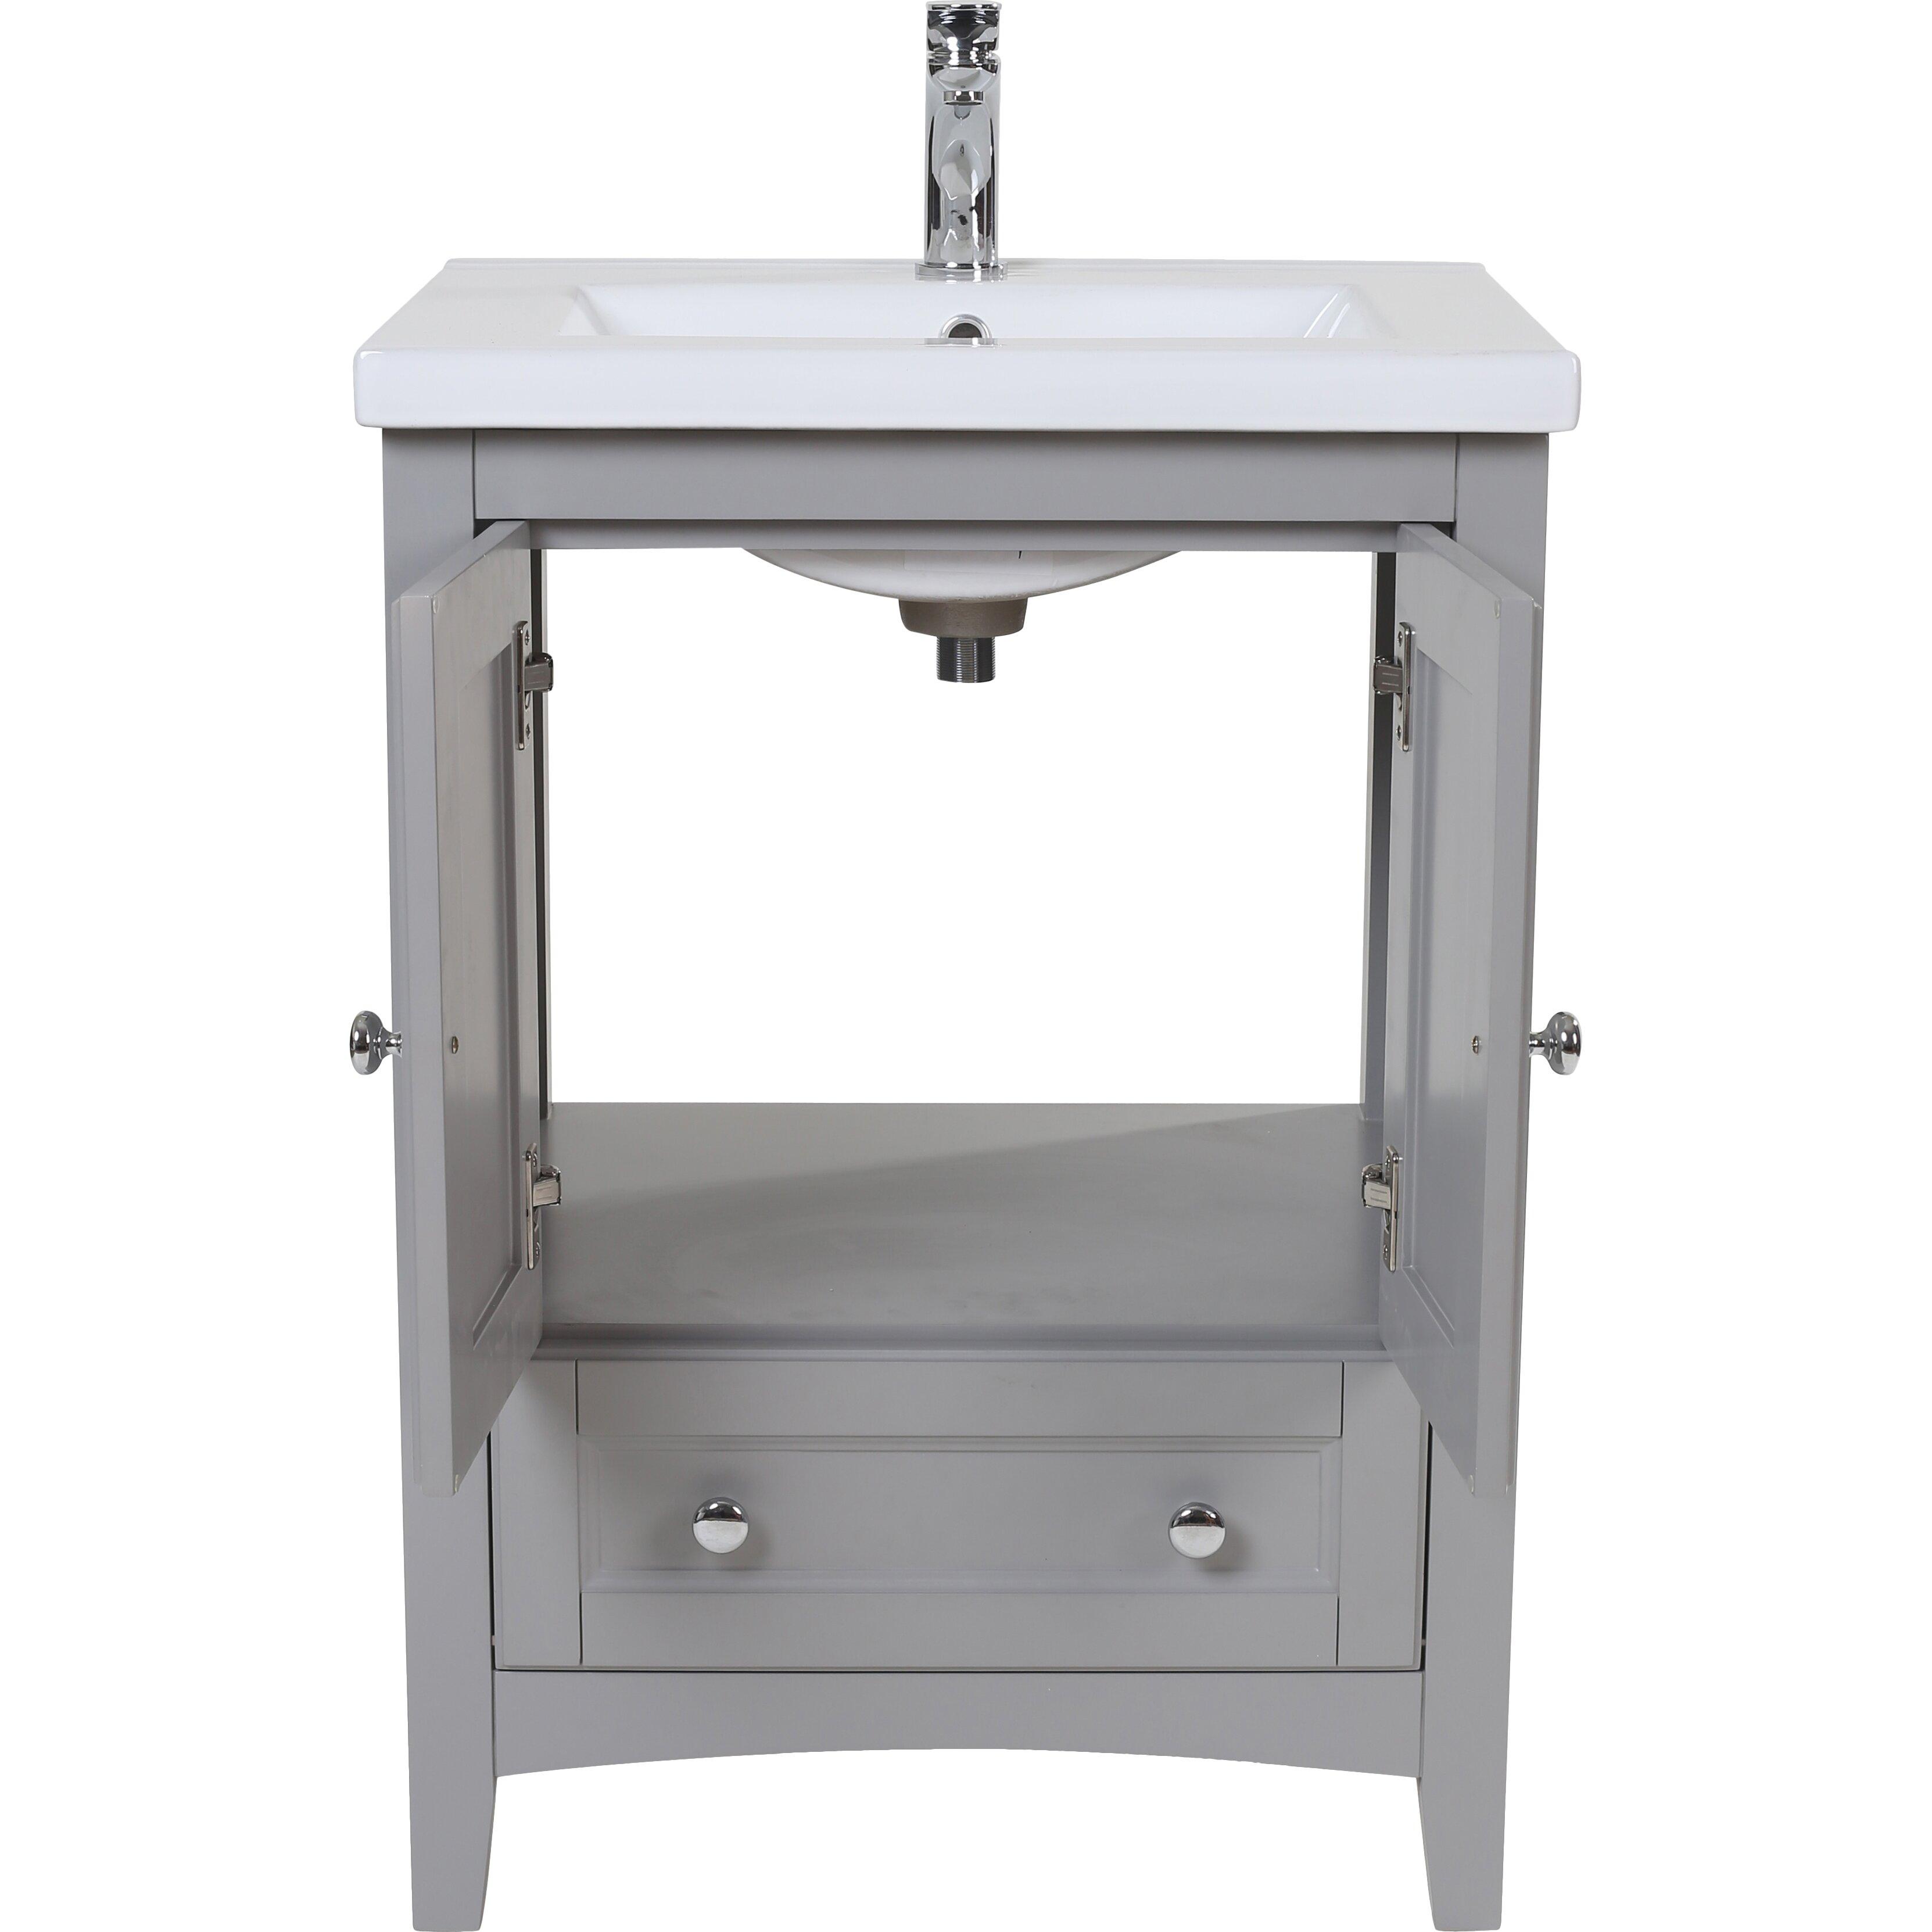 elegant lighting danville 24quot single bathroom vanity set - Ensemble Vanite Armoire